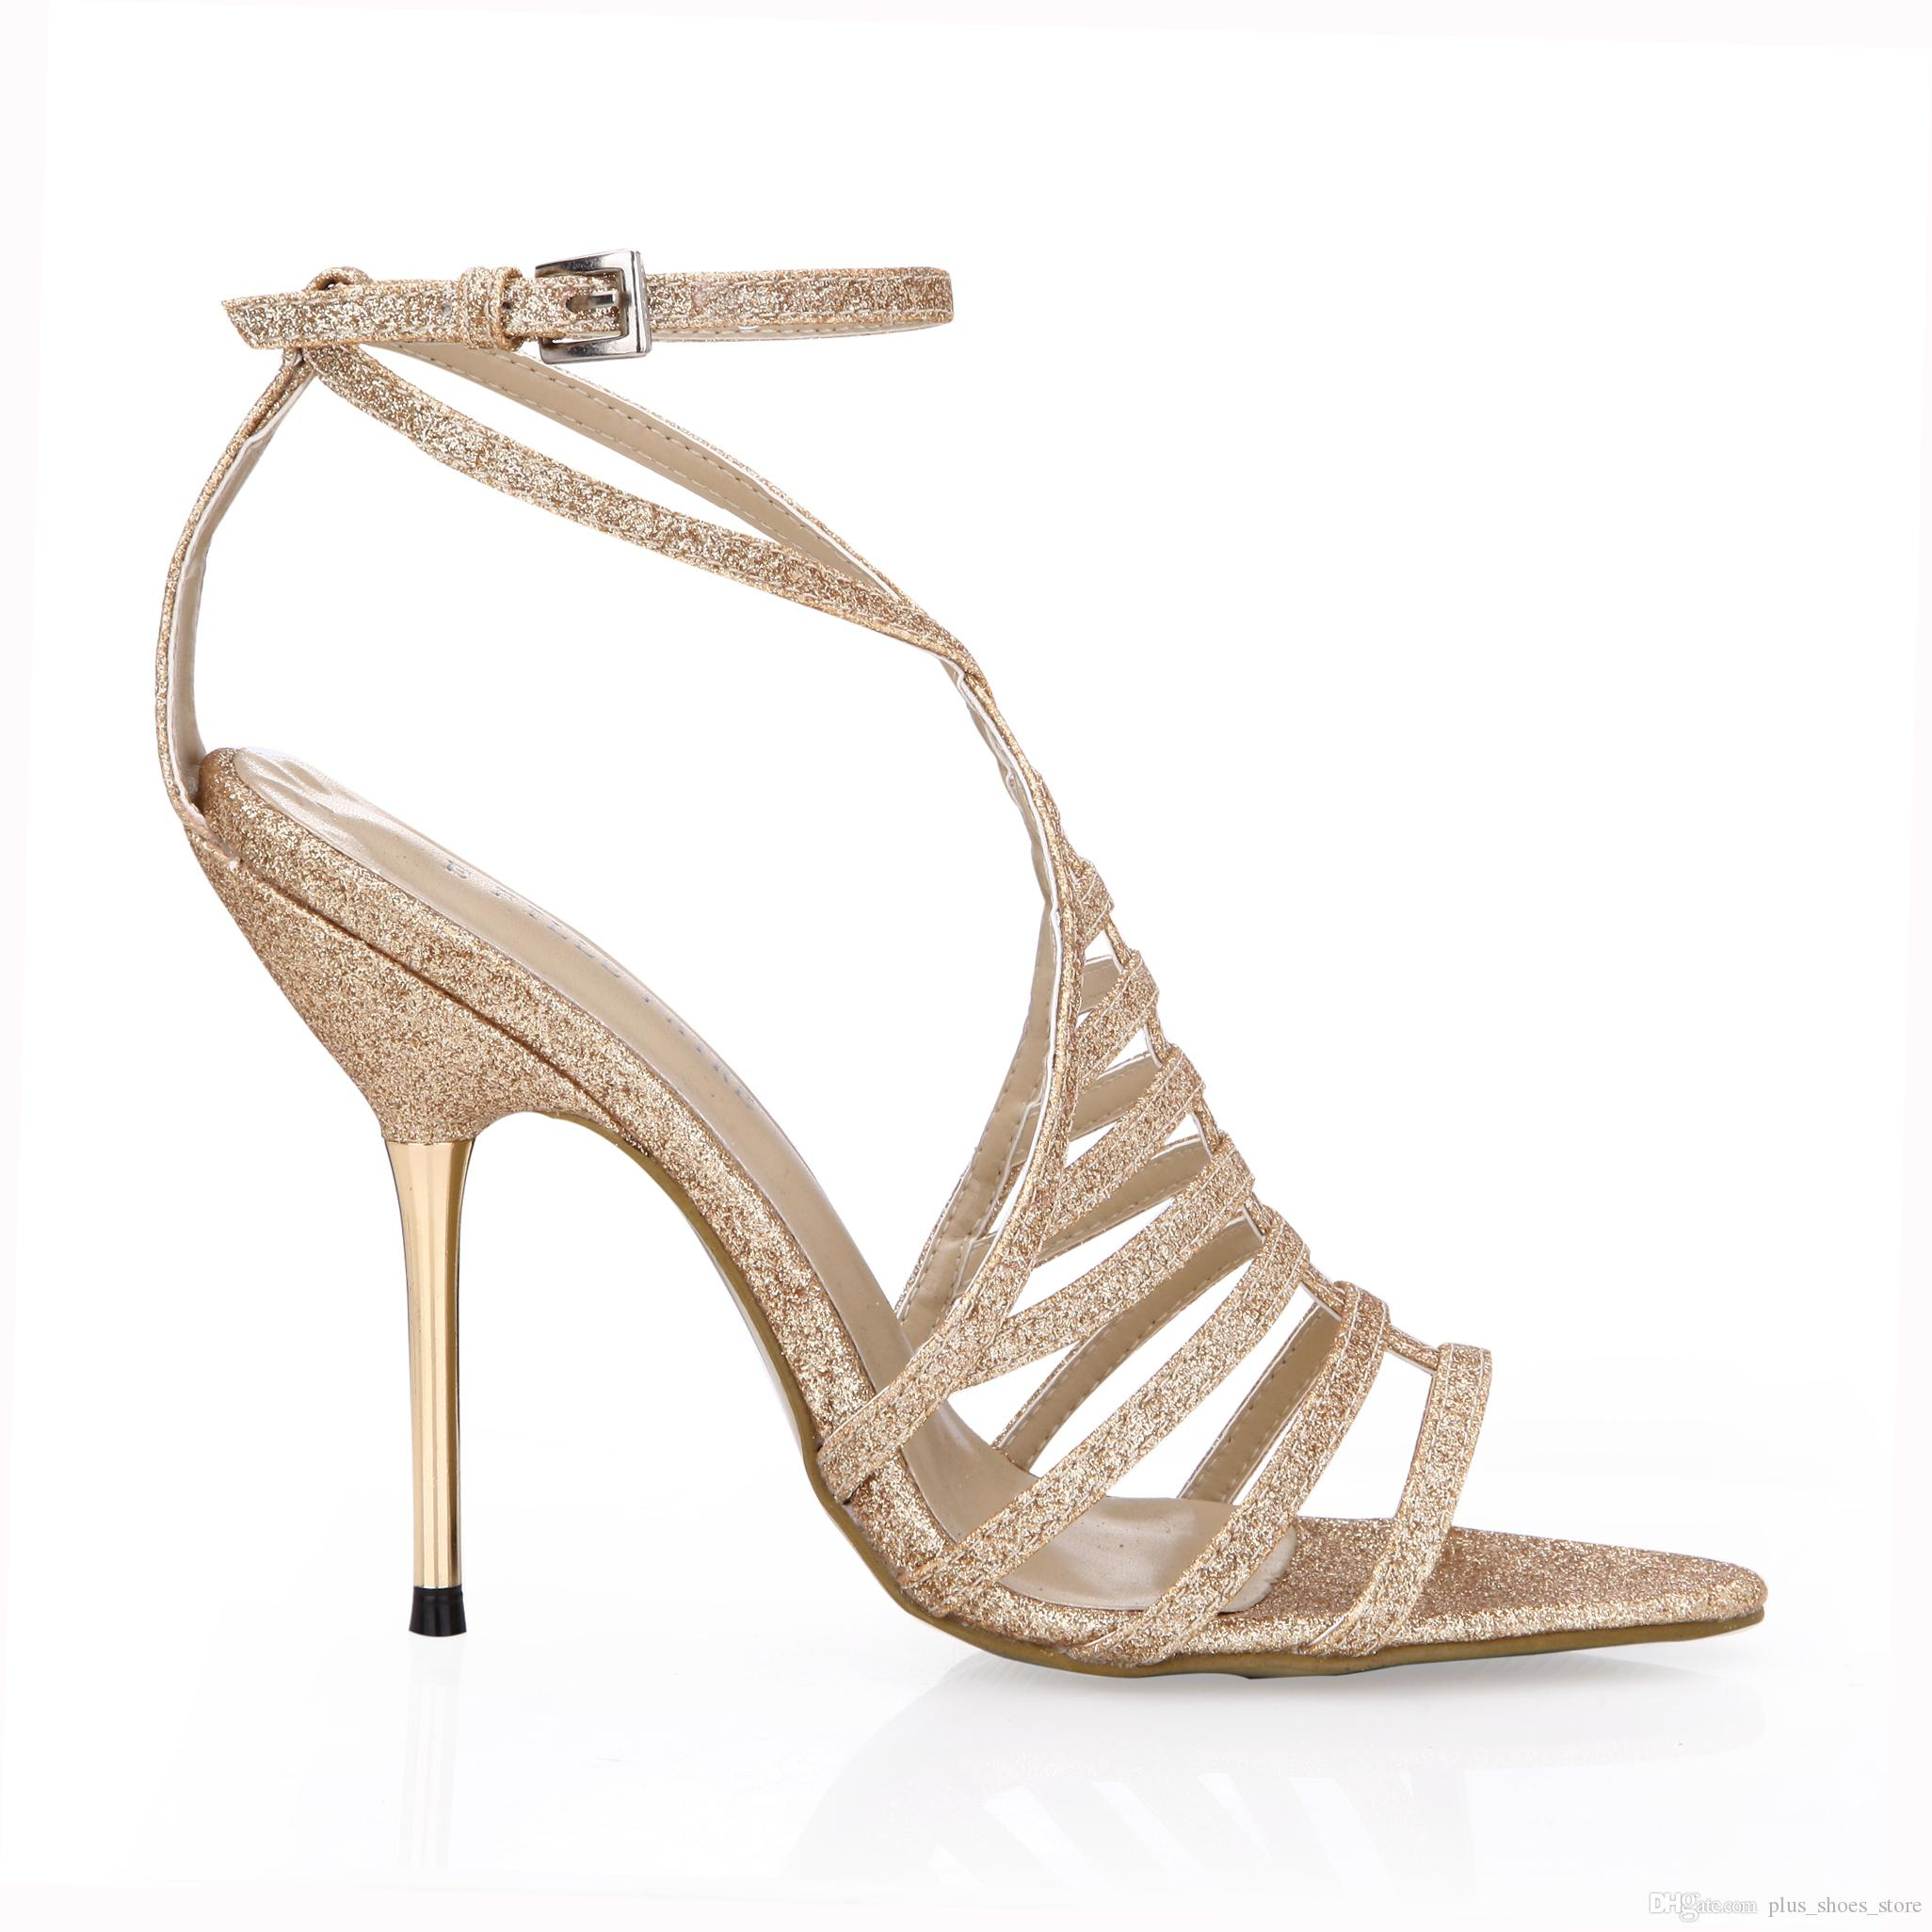 new styles 3ea2f acb8d Gold Sandalen Frauen Sommer Stil Damen Party Schuhe 2017 Real Image Metall  Dünne Fersen Hochzeit Schuhe Zapatos Mujer Damen Schuhe